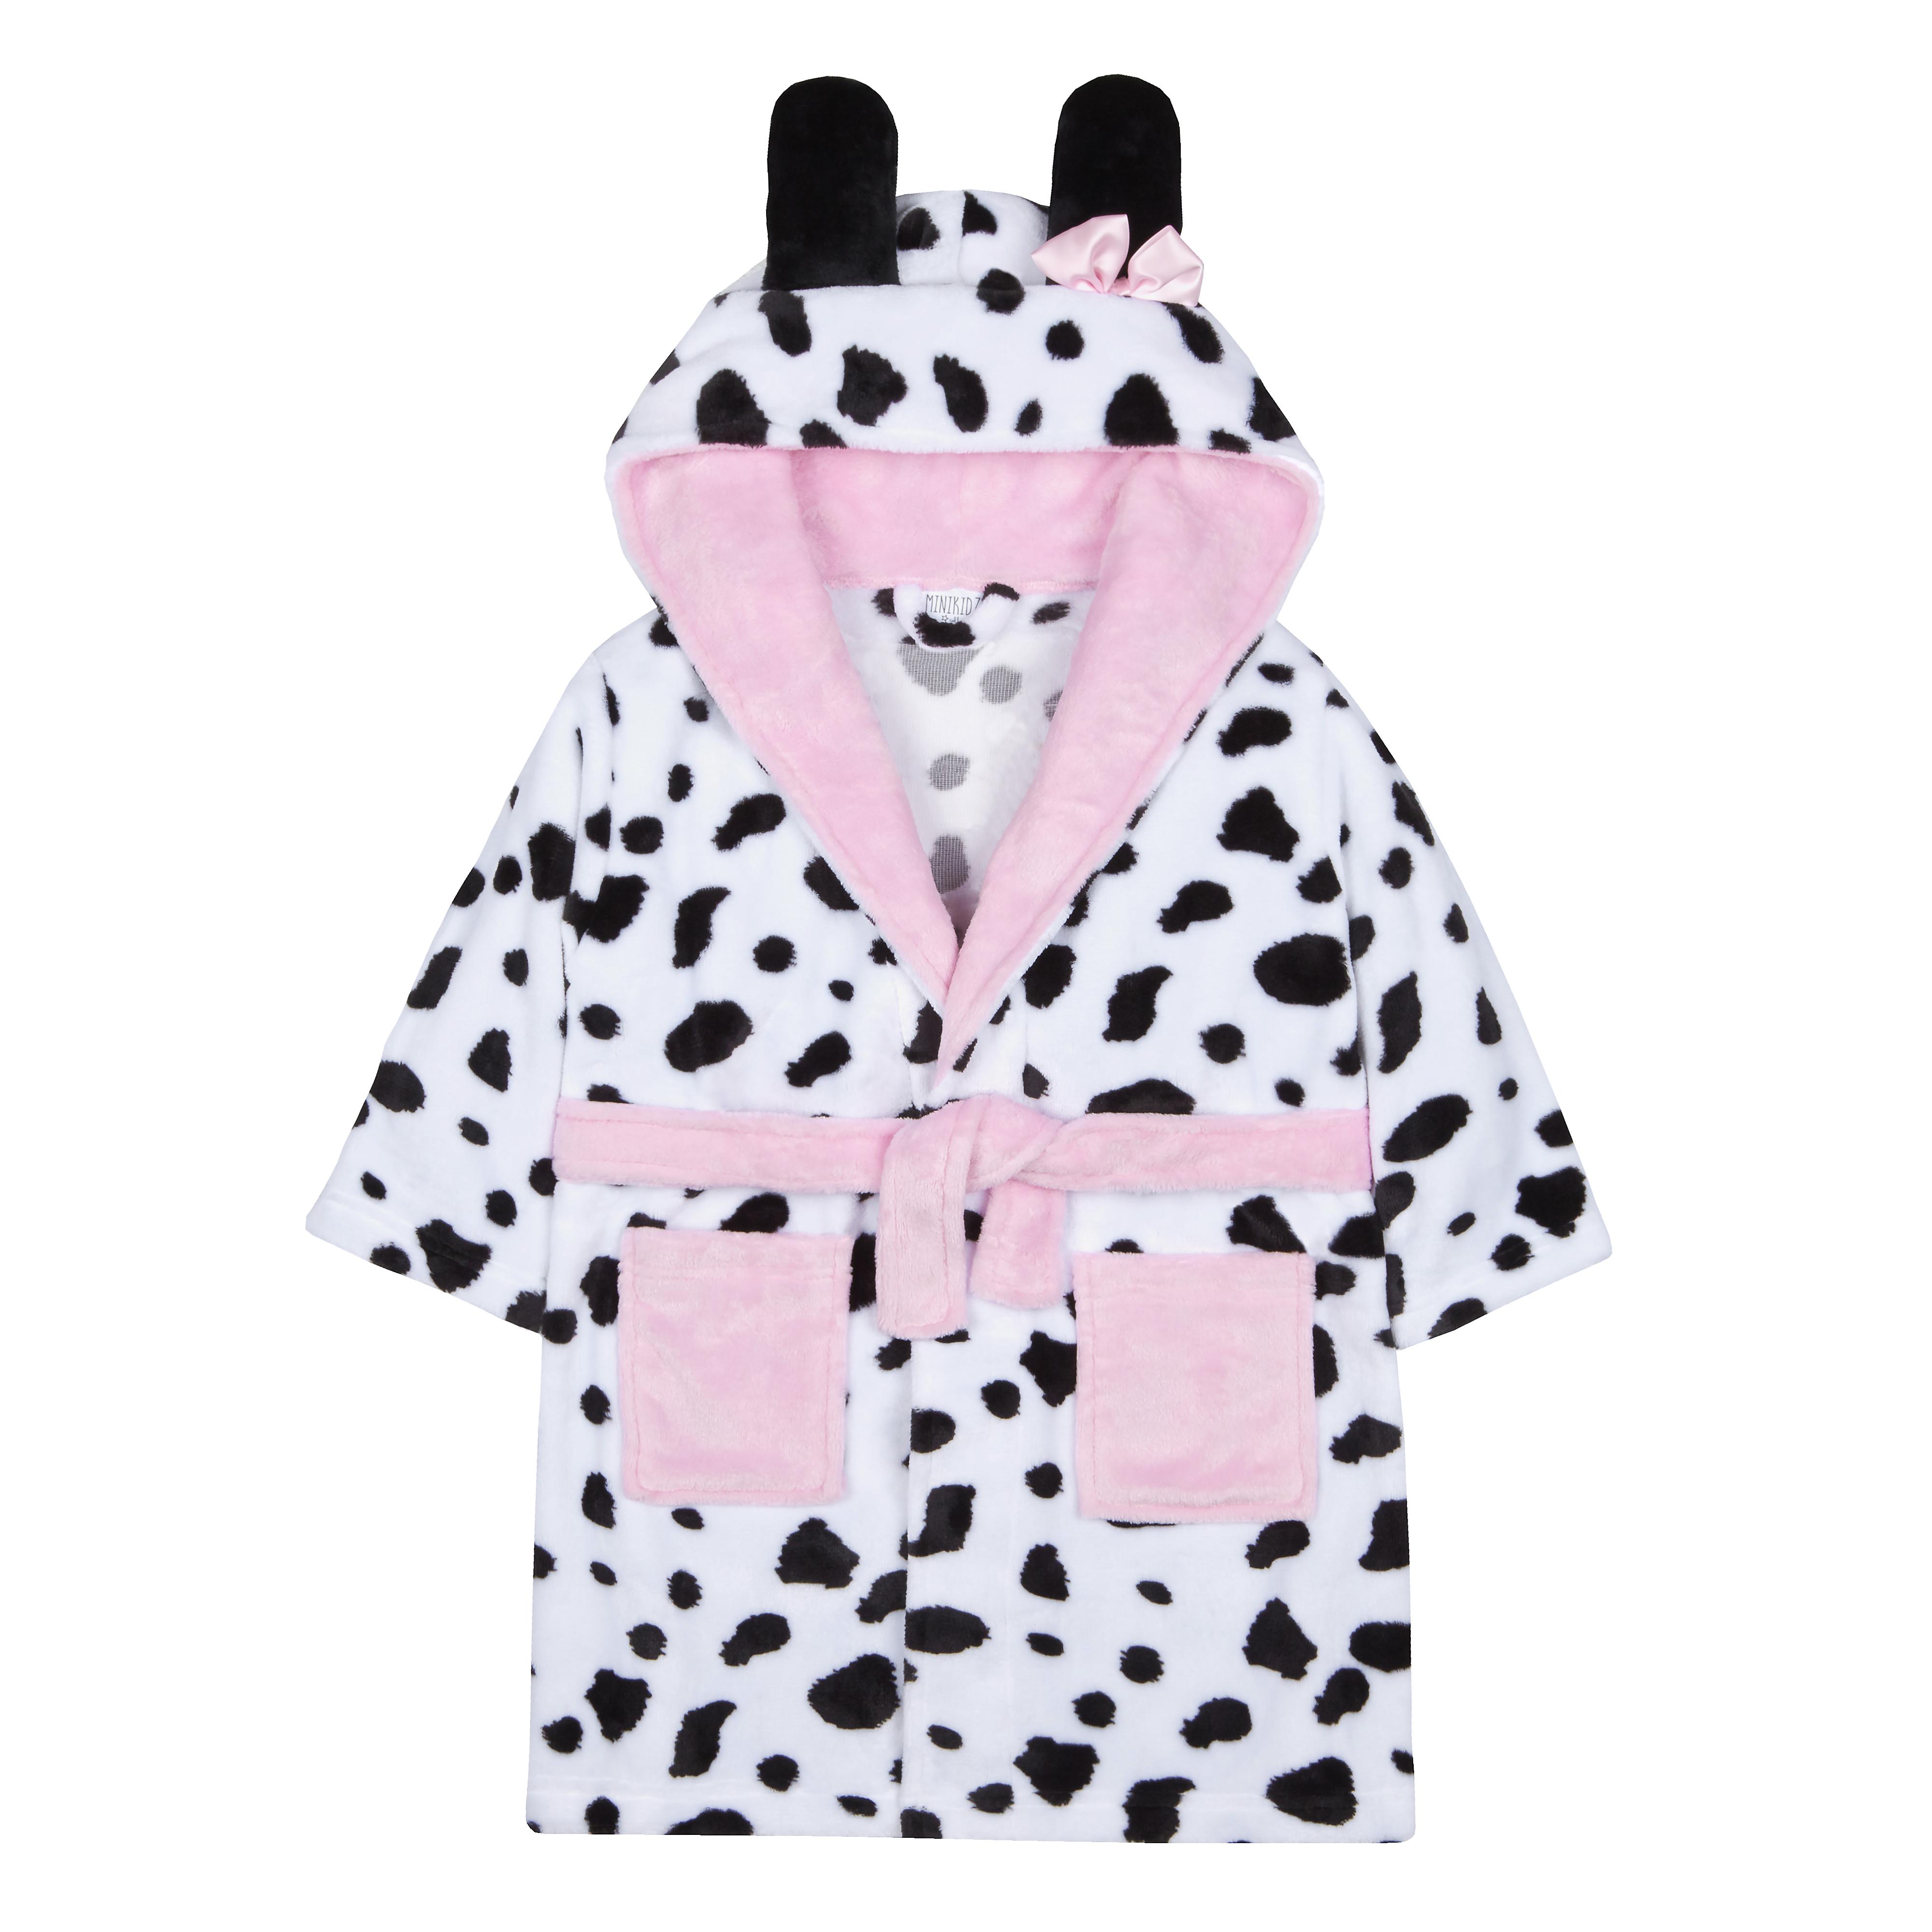 Infant Girls Dalmatian Print Dressing Gown Robe Plush Fleece Hooded Animal  Soft afda00d47